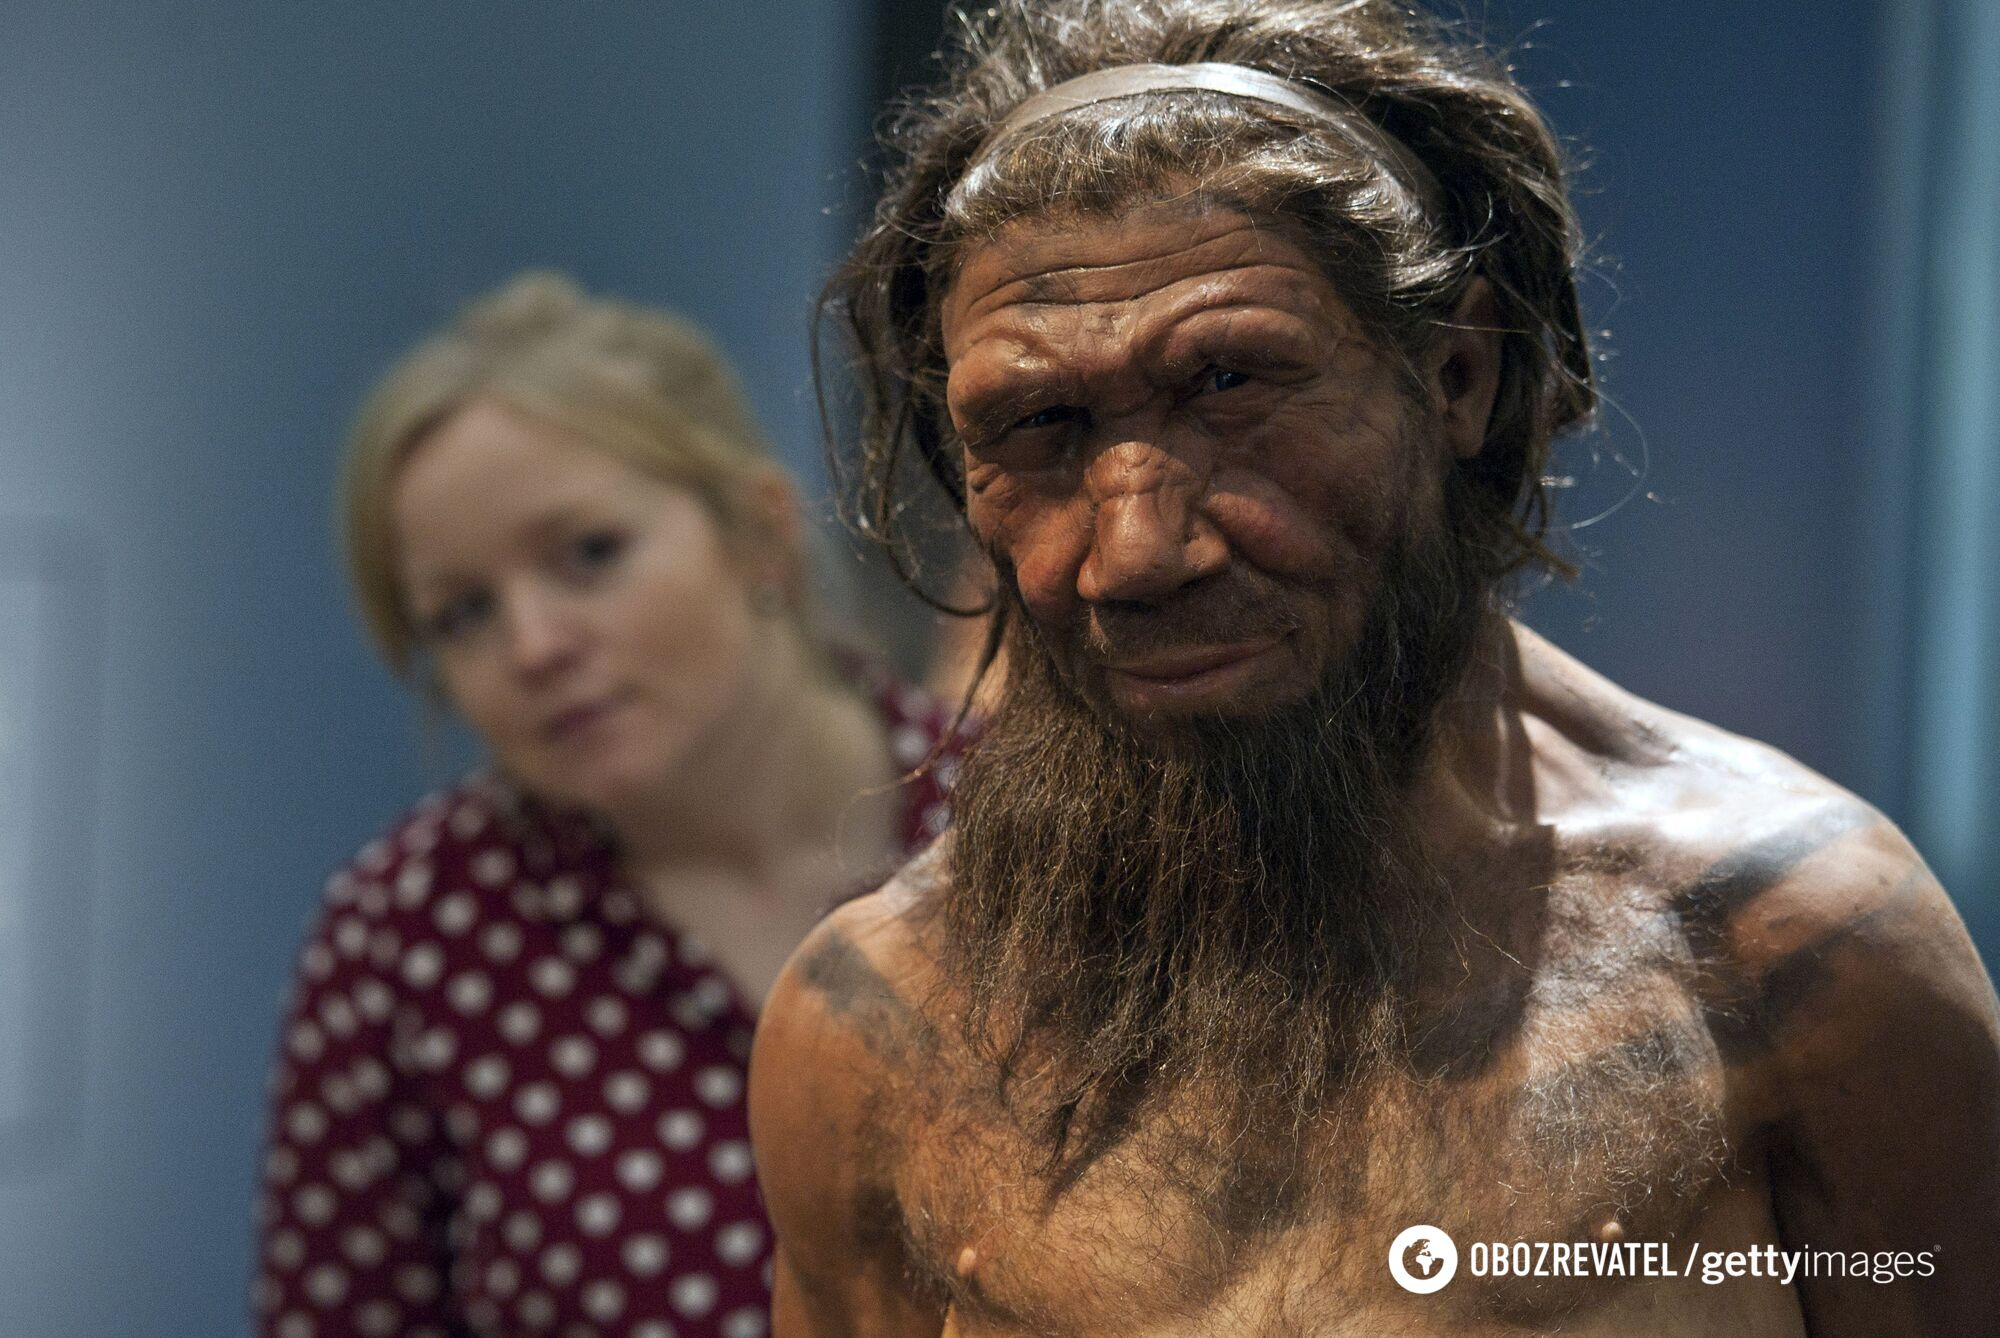 Неандерталец, реконструкция внешнего вида